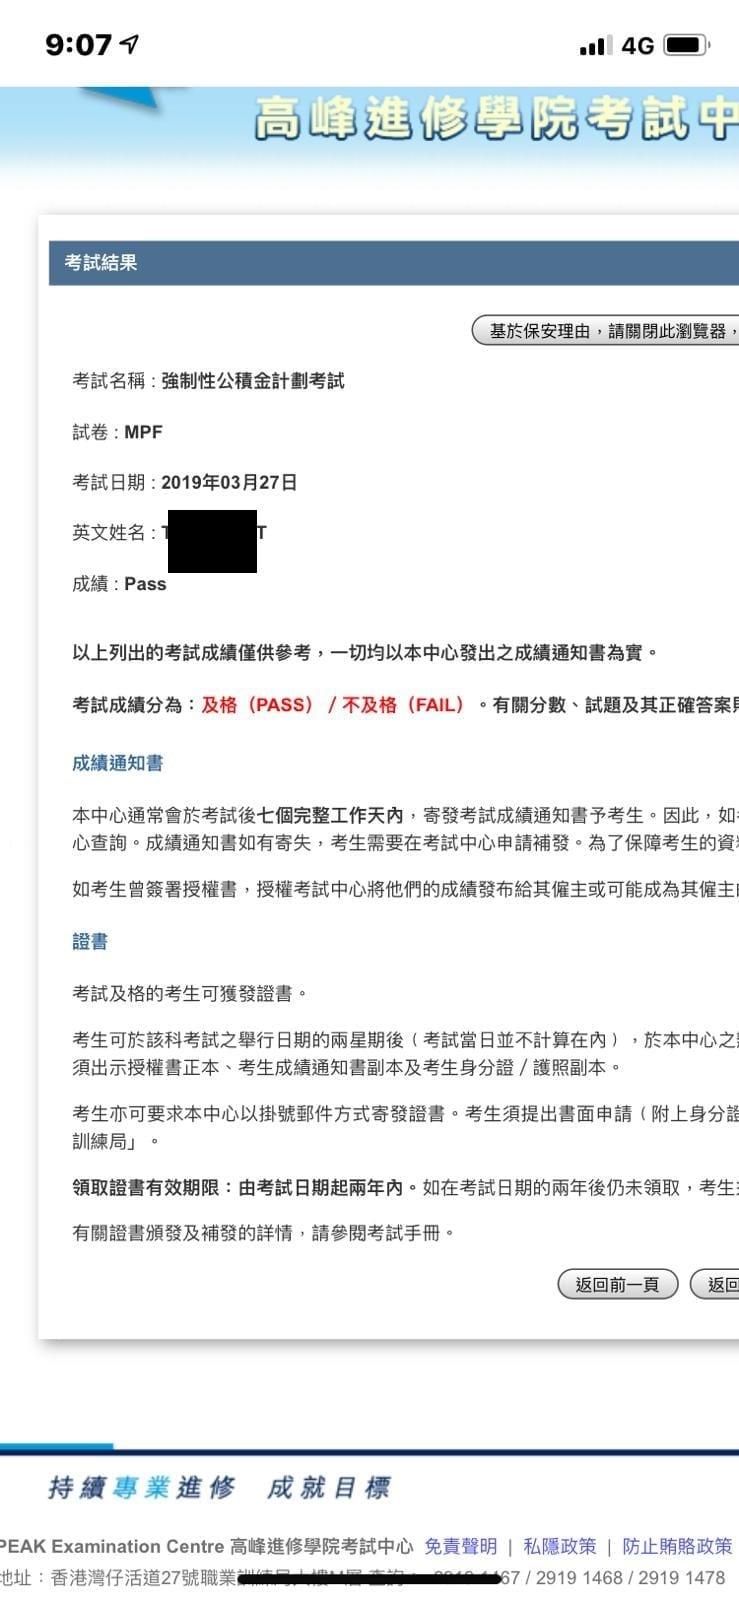 HKT 27/3/2019 MPFE 強積金中介人資格考試 Pass